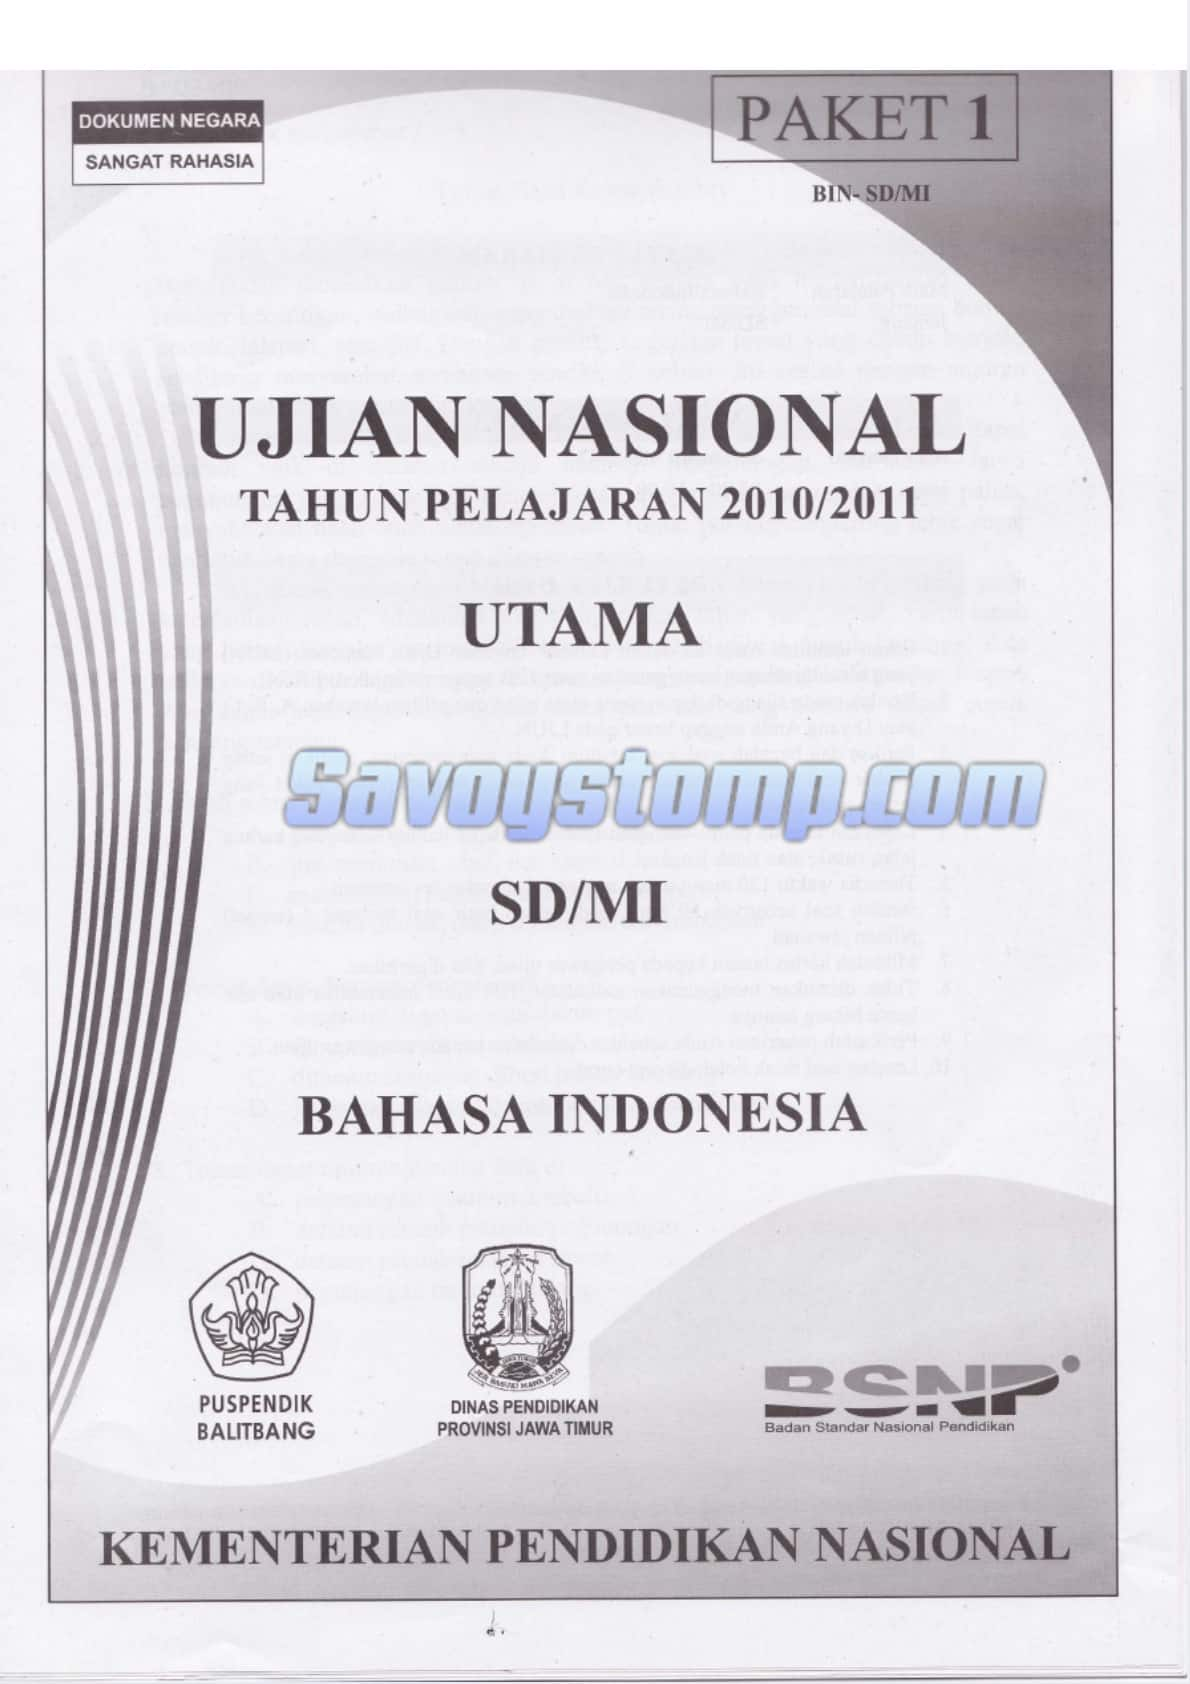 Belajar-Contoh-Soal-UN-Bahasa-Indonesia-SD-dengan-Kurikulum-13